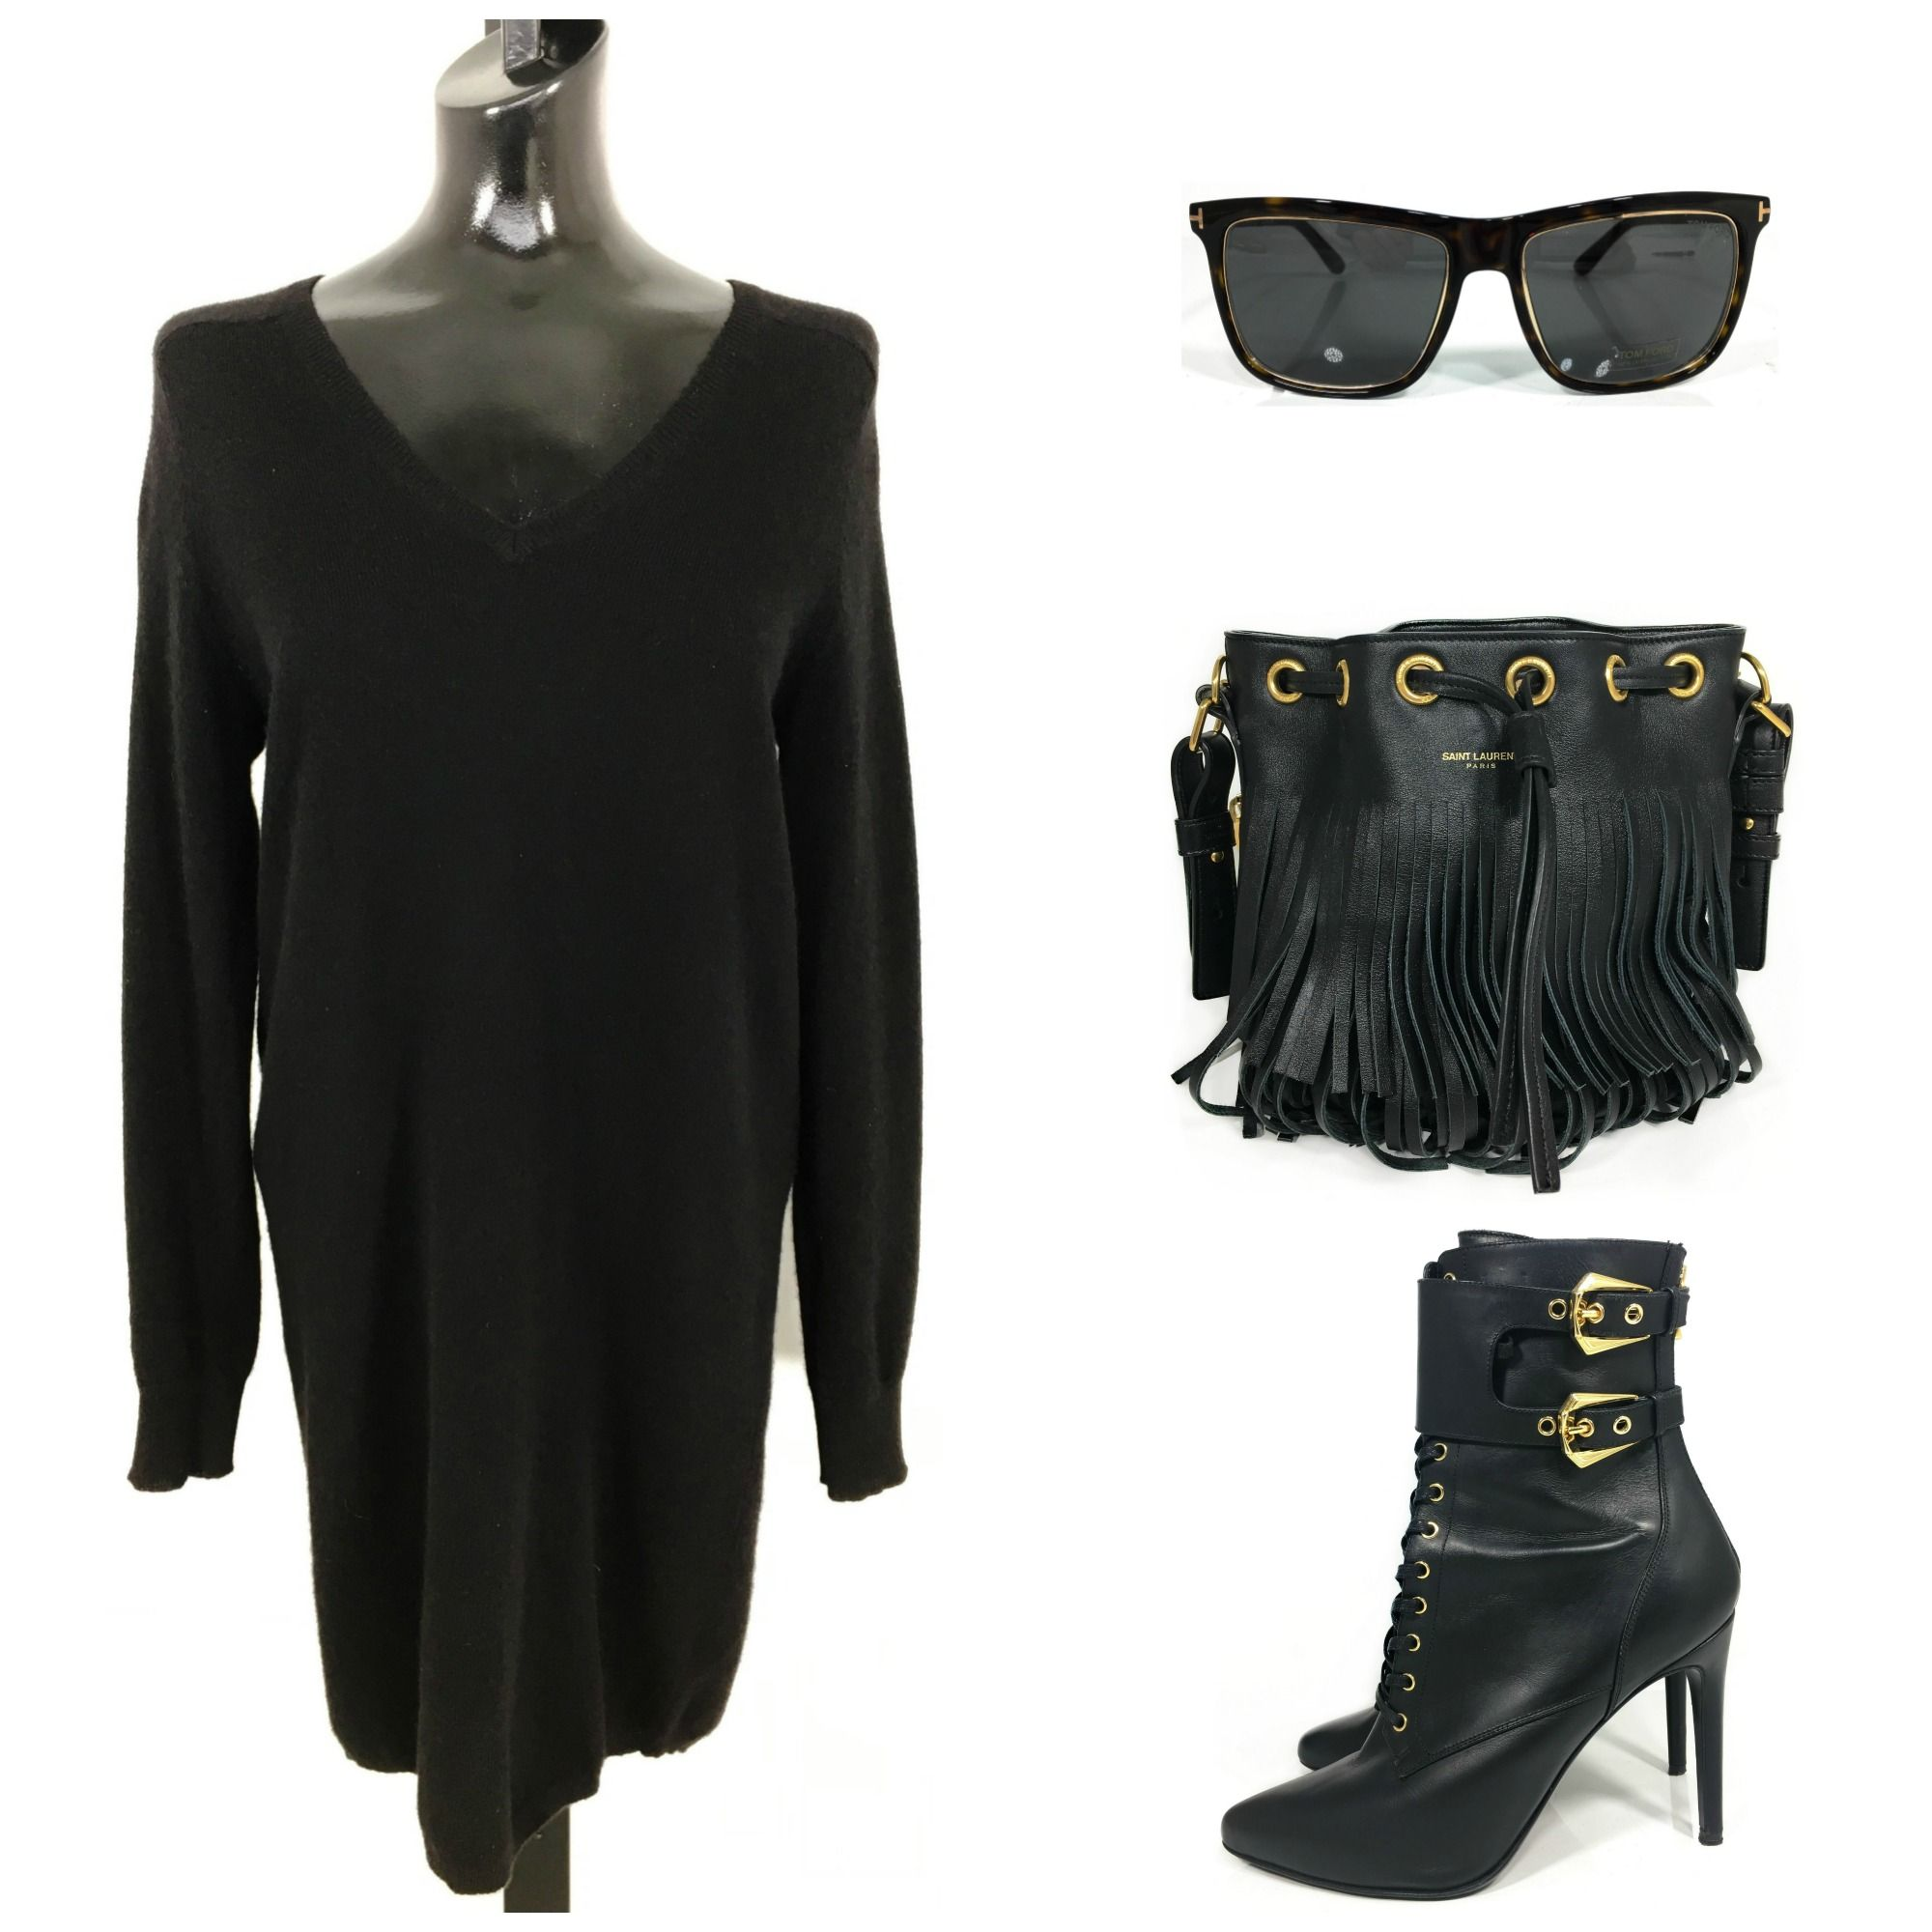 175c30087961 360 Cashmere Sweater Dress (S)  98  Tom Ford Sunglasses  298  Saint Laurent  Black Bucket Bag  798  Balmain Lace Up Booties (IT 38.5)  448